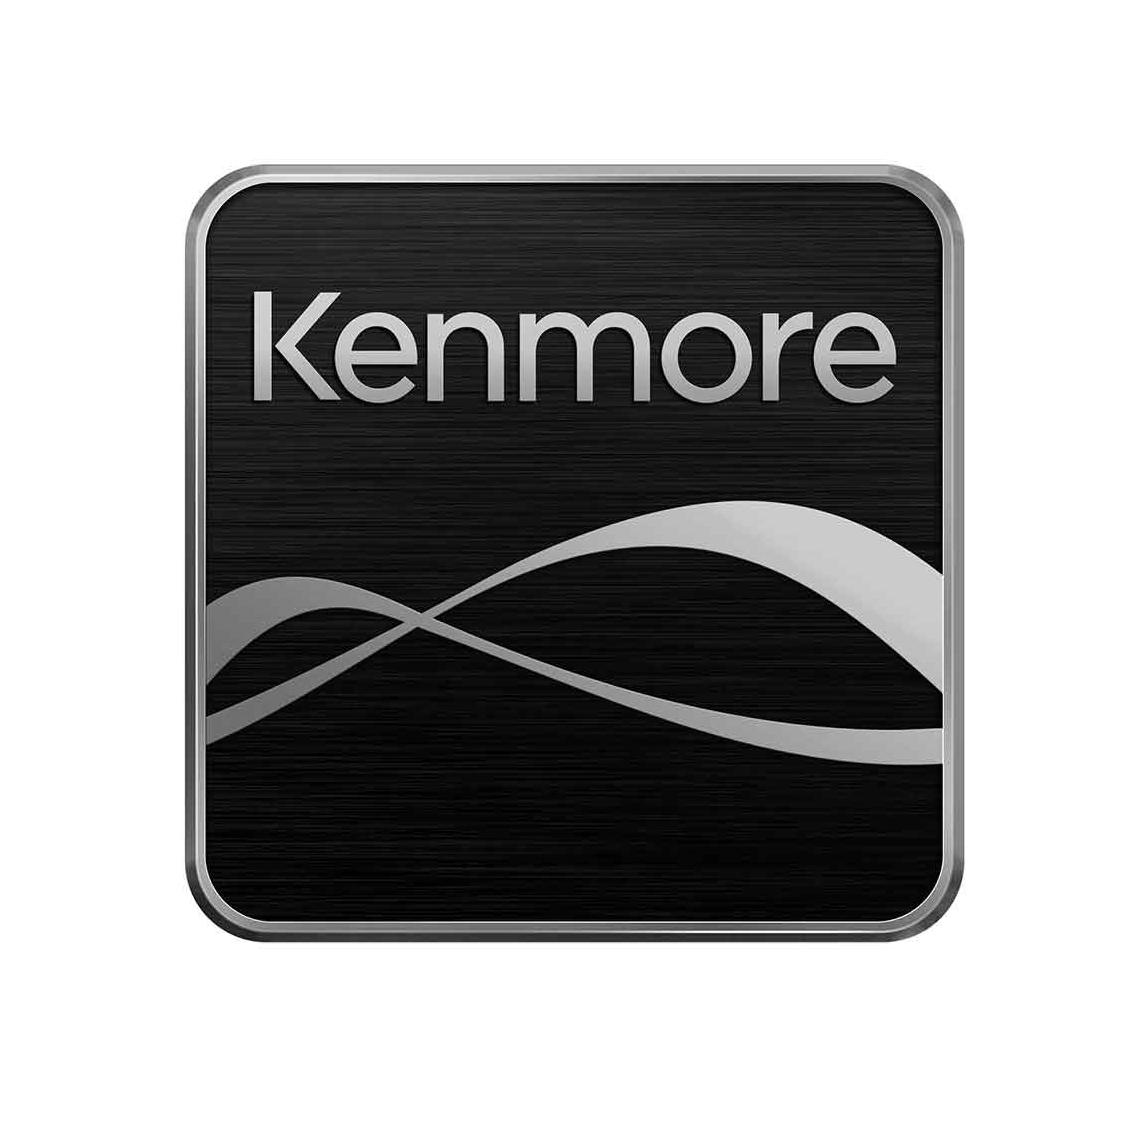 BW.Kenmore_Black_FINAL_FLAT.jpg